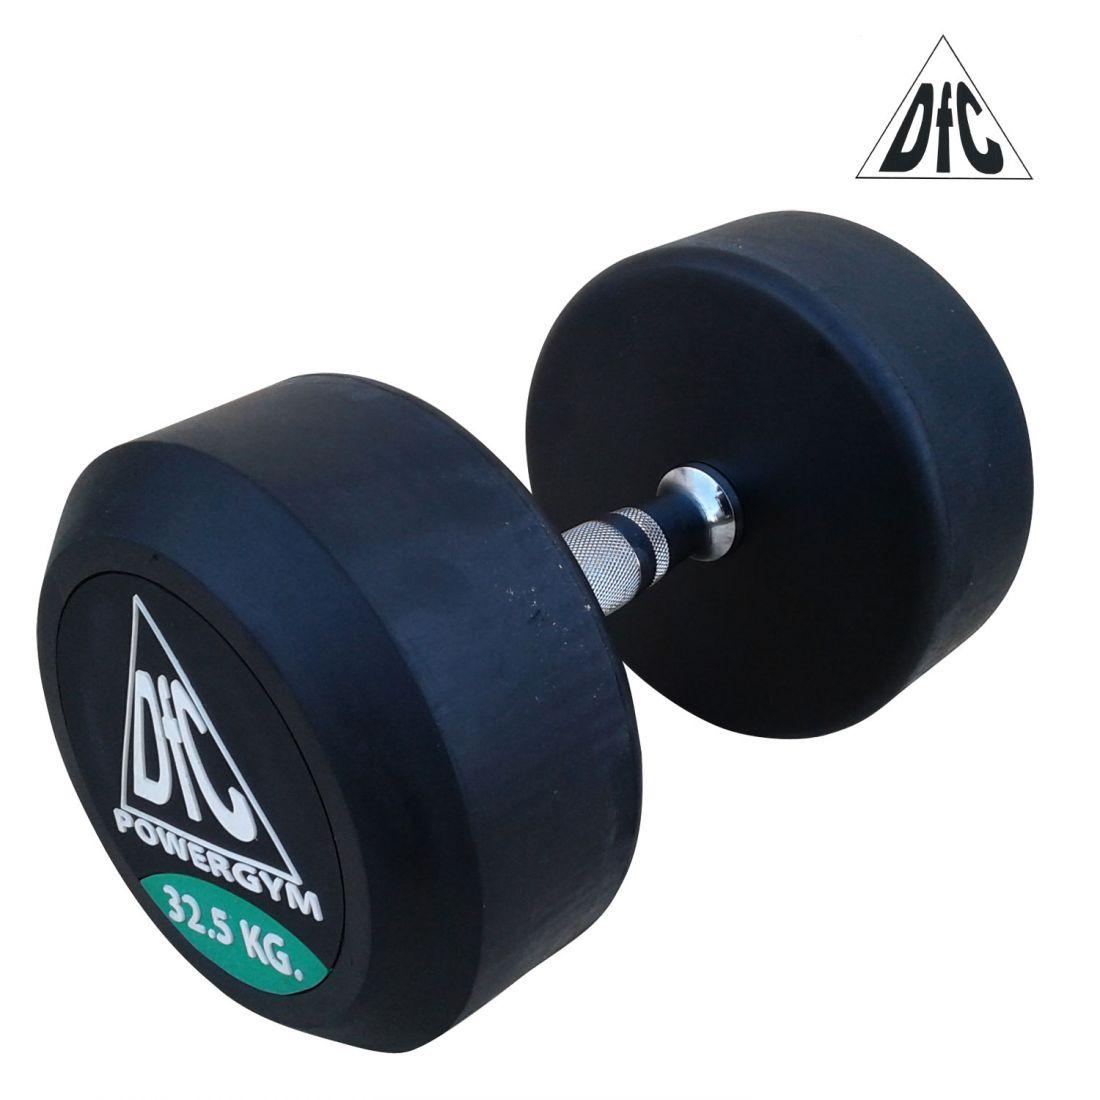 Гантели пара 32.5 кг DFC POWERGYM DB002-32.5